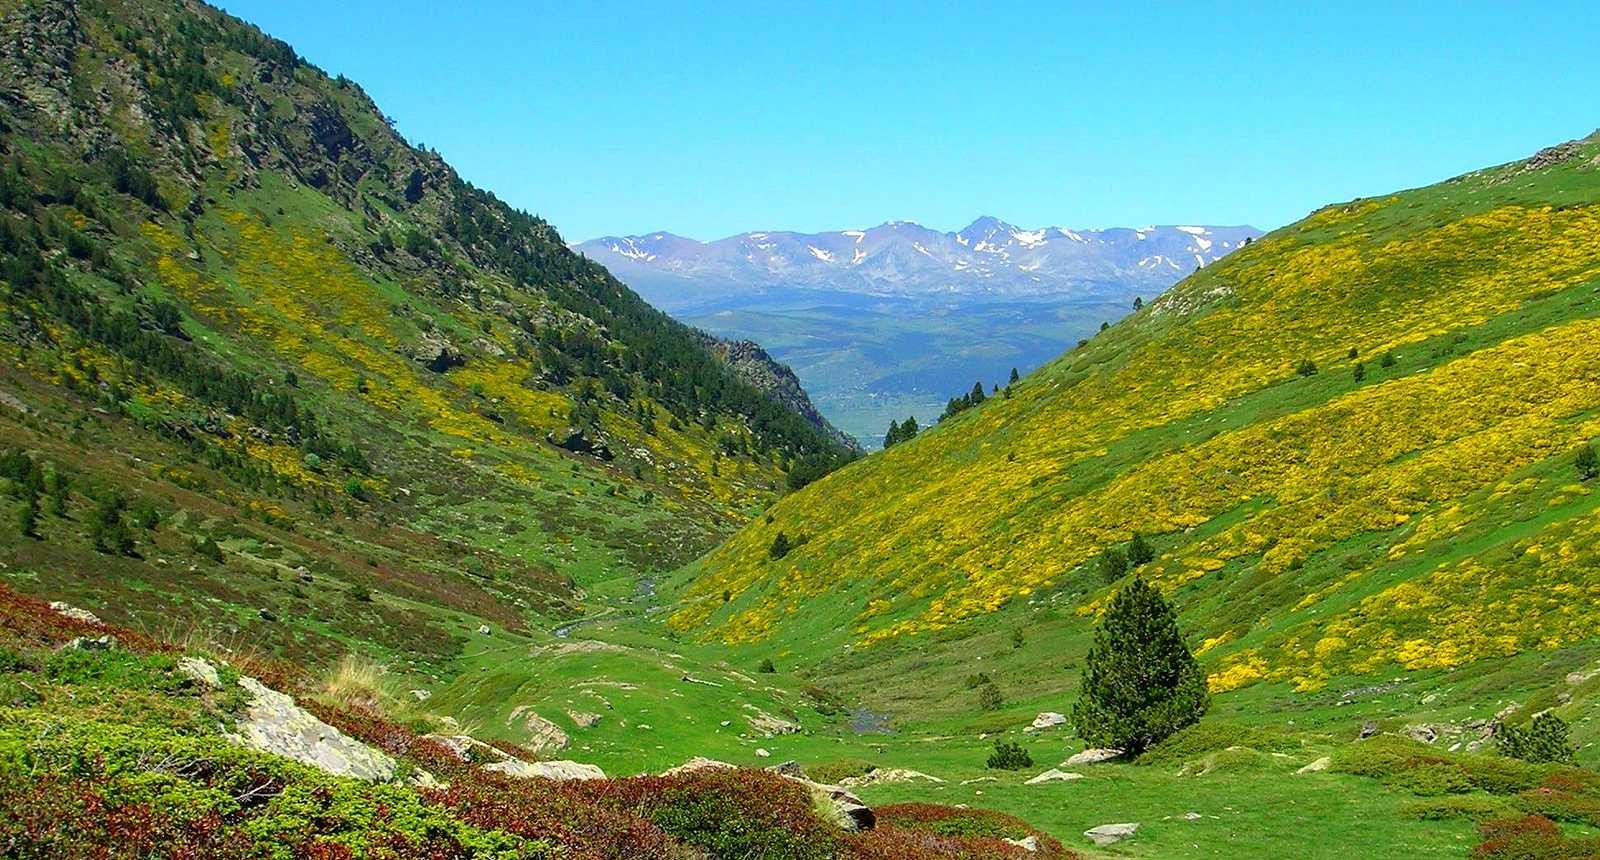 Syndicat d 39 initiative d 39 eyne eyne 66800 pyr n es - Office de tourisme pyrenees orientales ...